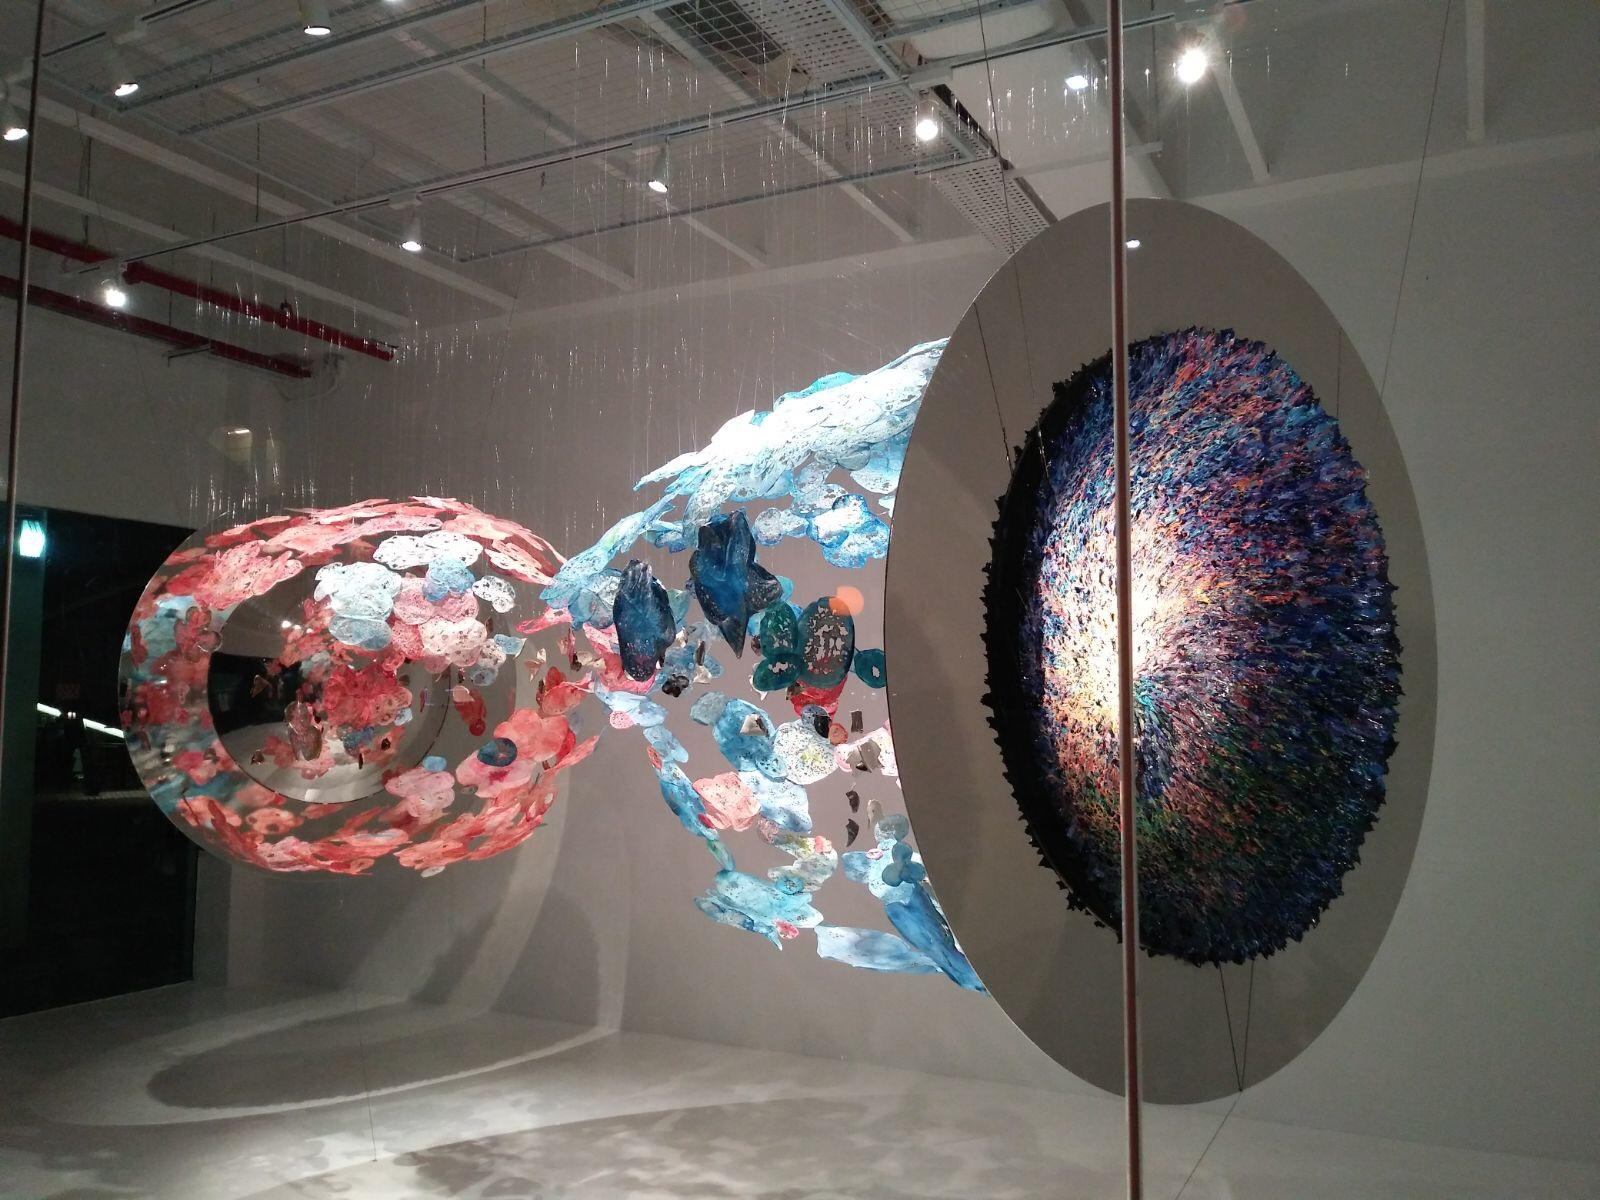 SOLO EXHIBITION OPENING_NICOLA ANTHONY_SINGAPORE ART MUSEUM_4.JPG